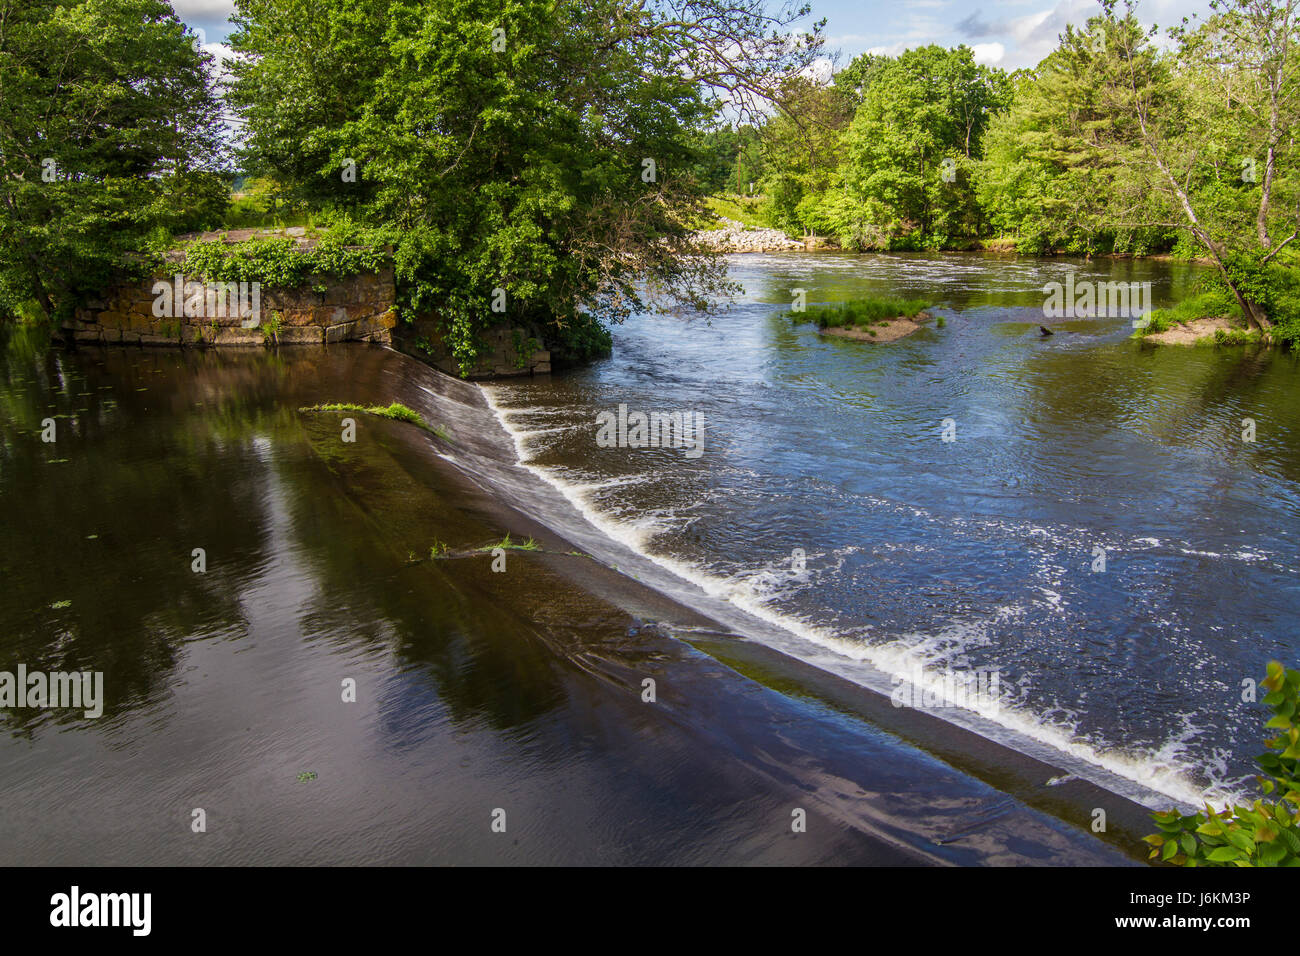 The Blackstone River in Uxbridge, MA - Stock Image